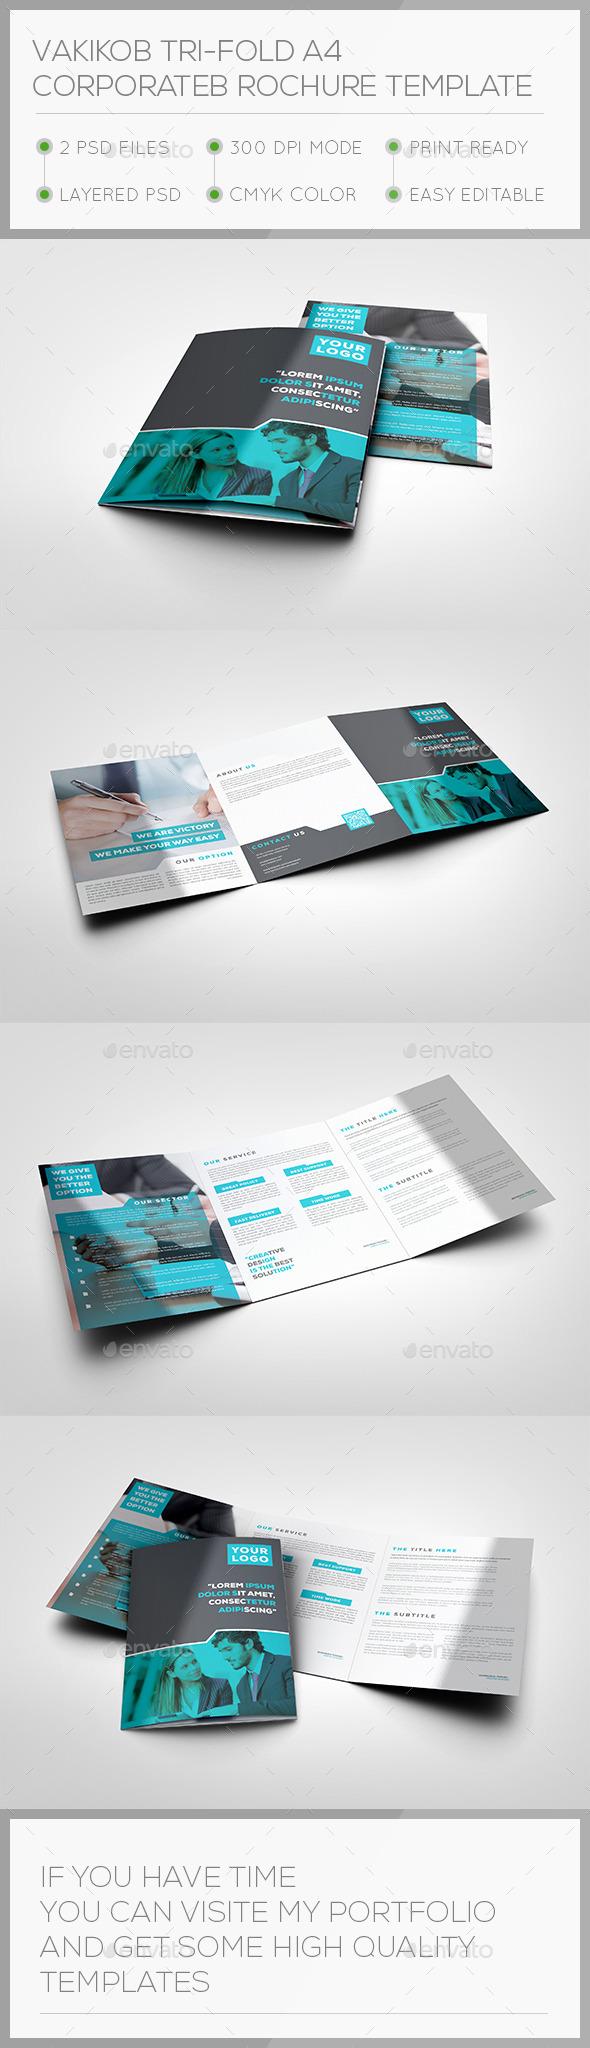 a4 tri fold brochure template - vakikob tri fold a4 corporate brochure template by evny